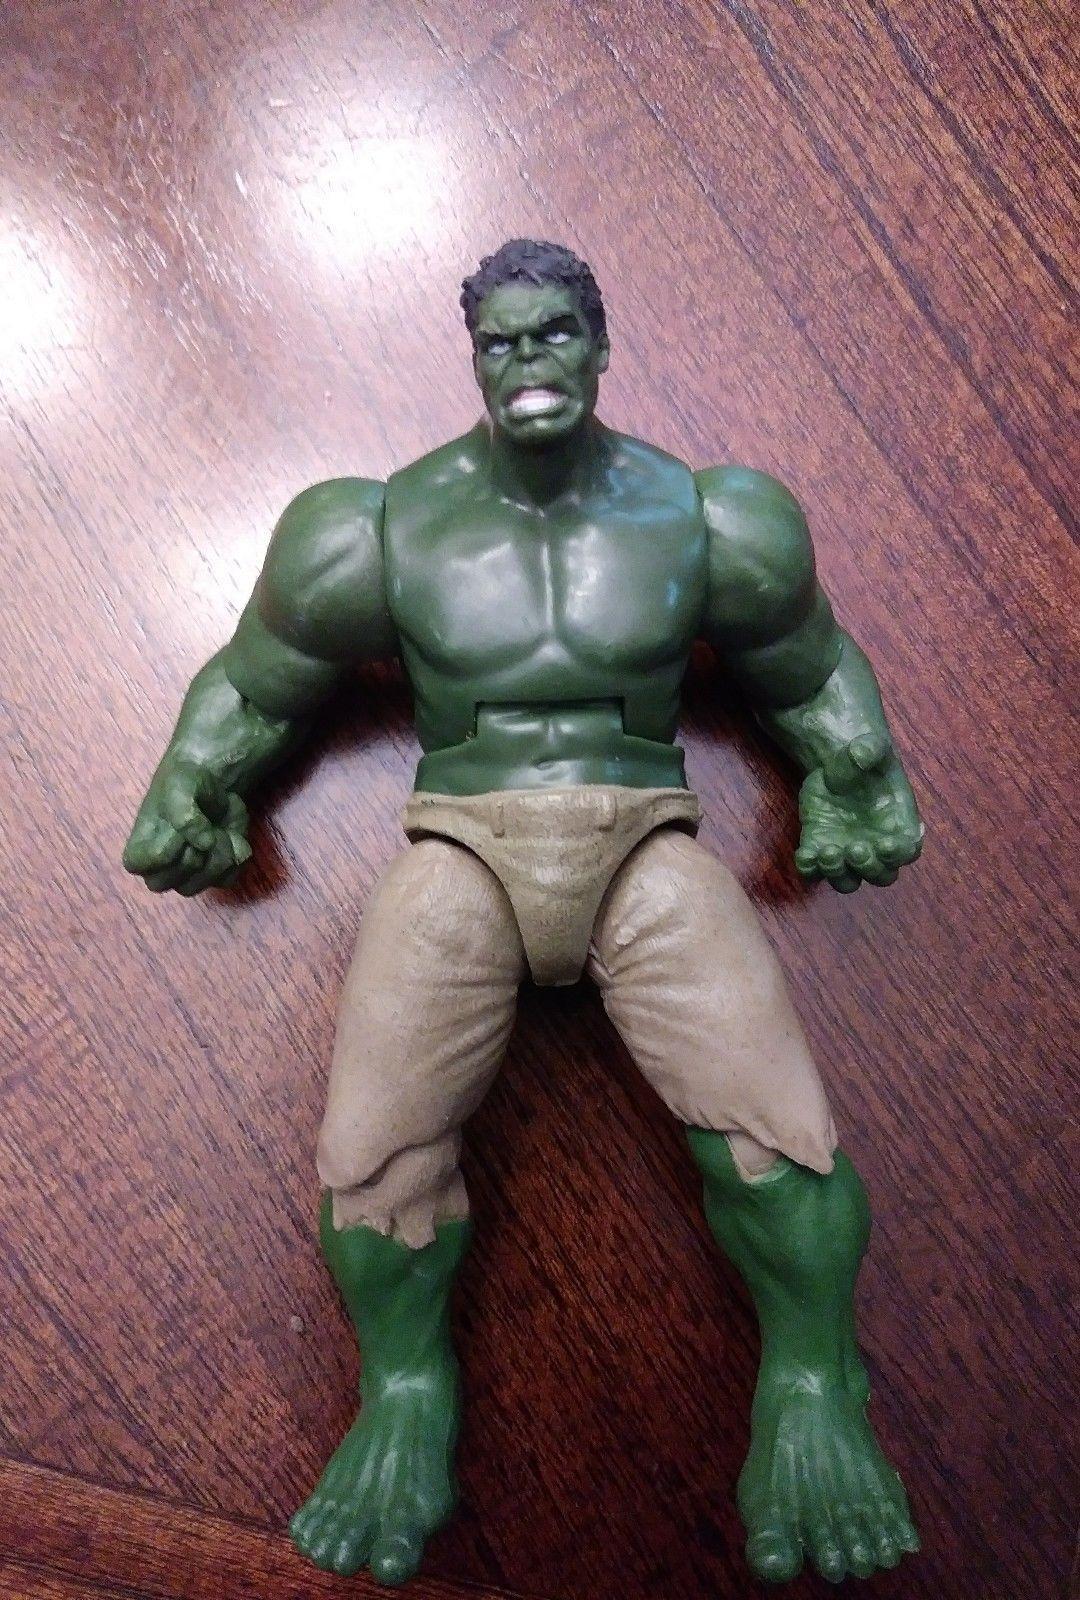 The Incredible Hulk 5 Hasbro 2011 Avengers Movie Action Figure Marvel Light